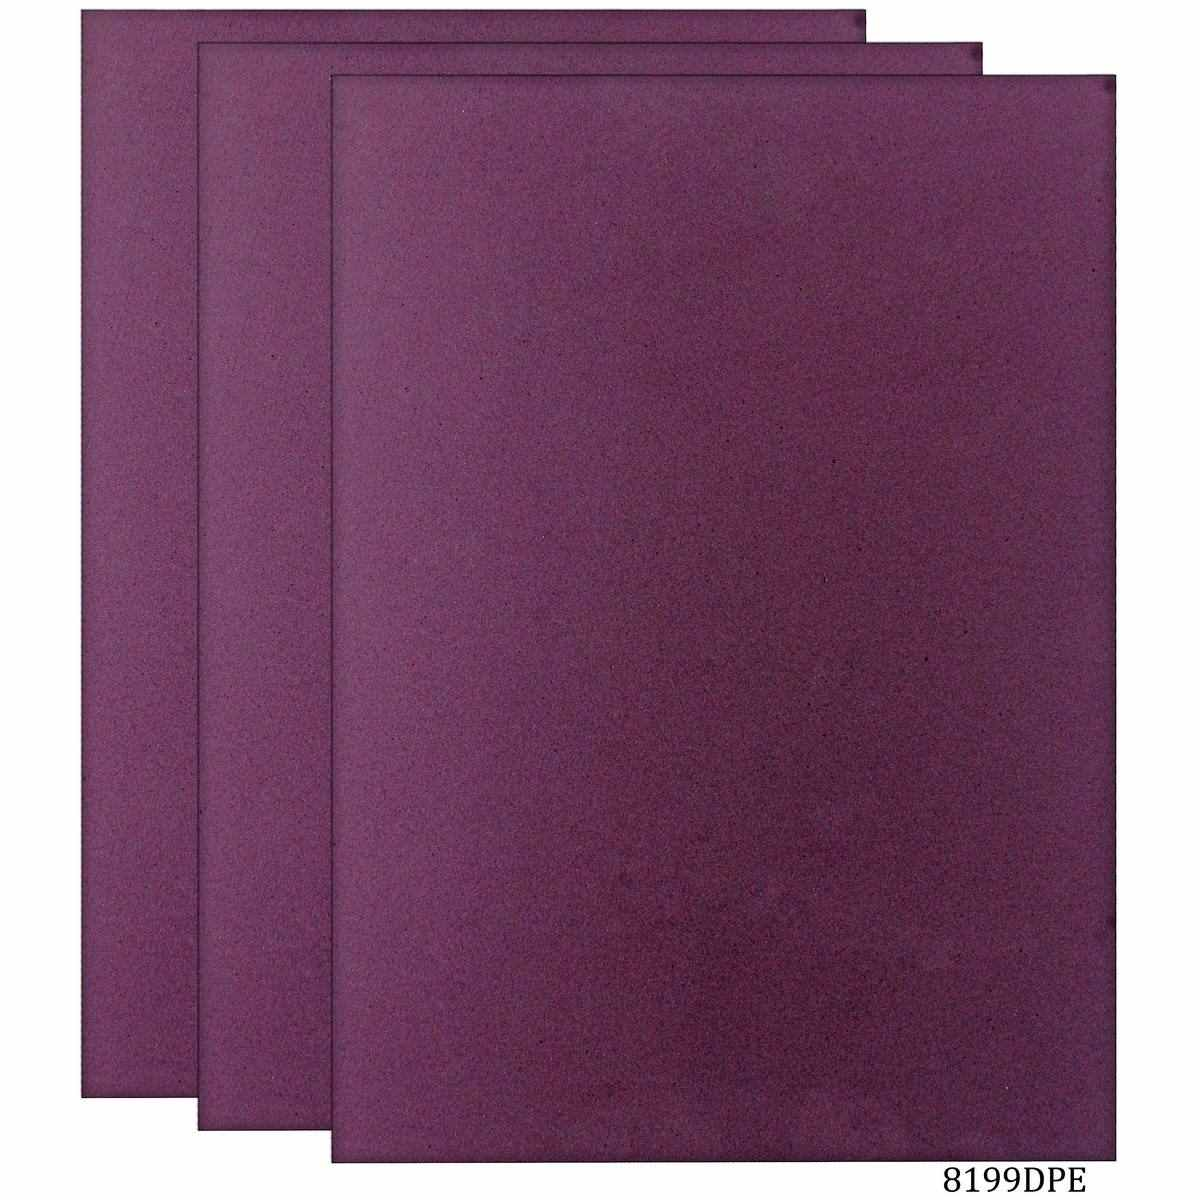 Foam Sheets A4 Size Without Sticker 3MM Purple